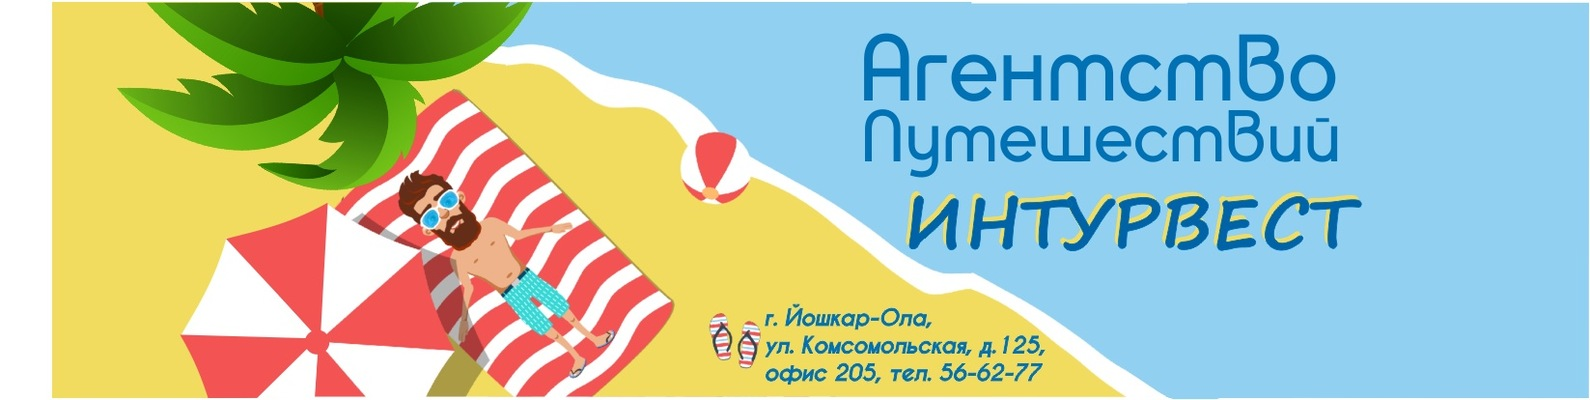 tur na kipr polis 30 205 rub chel 1 - Тур на Кипр Полис 30 205 руб. чел.